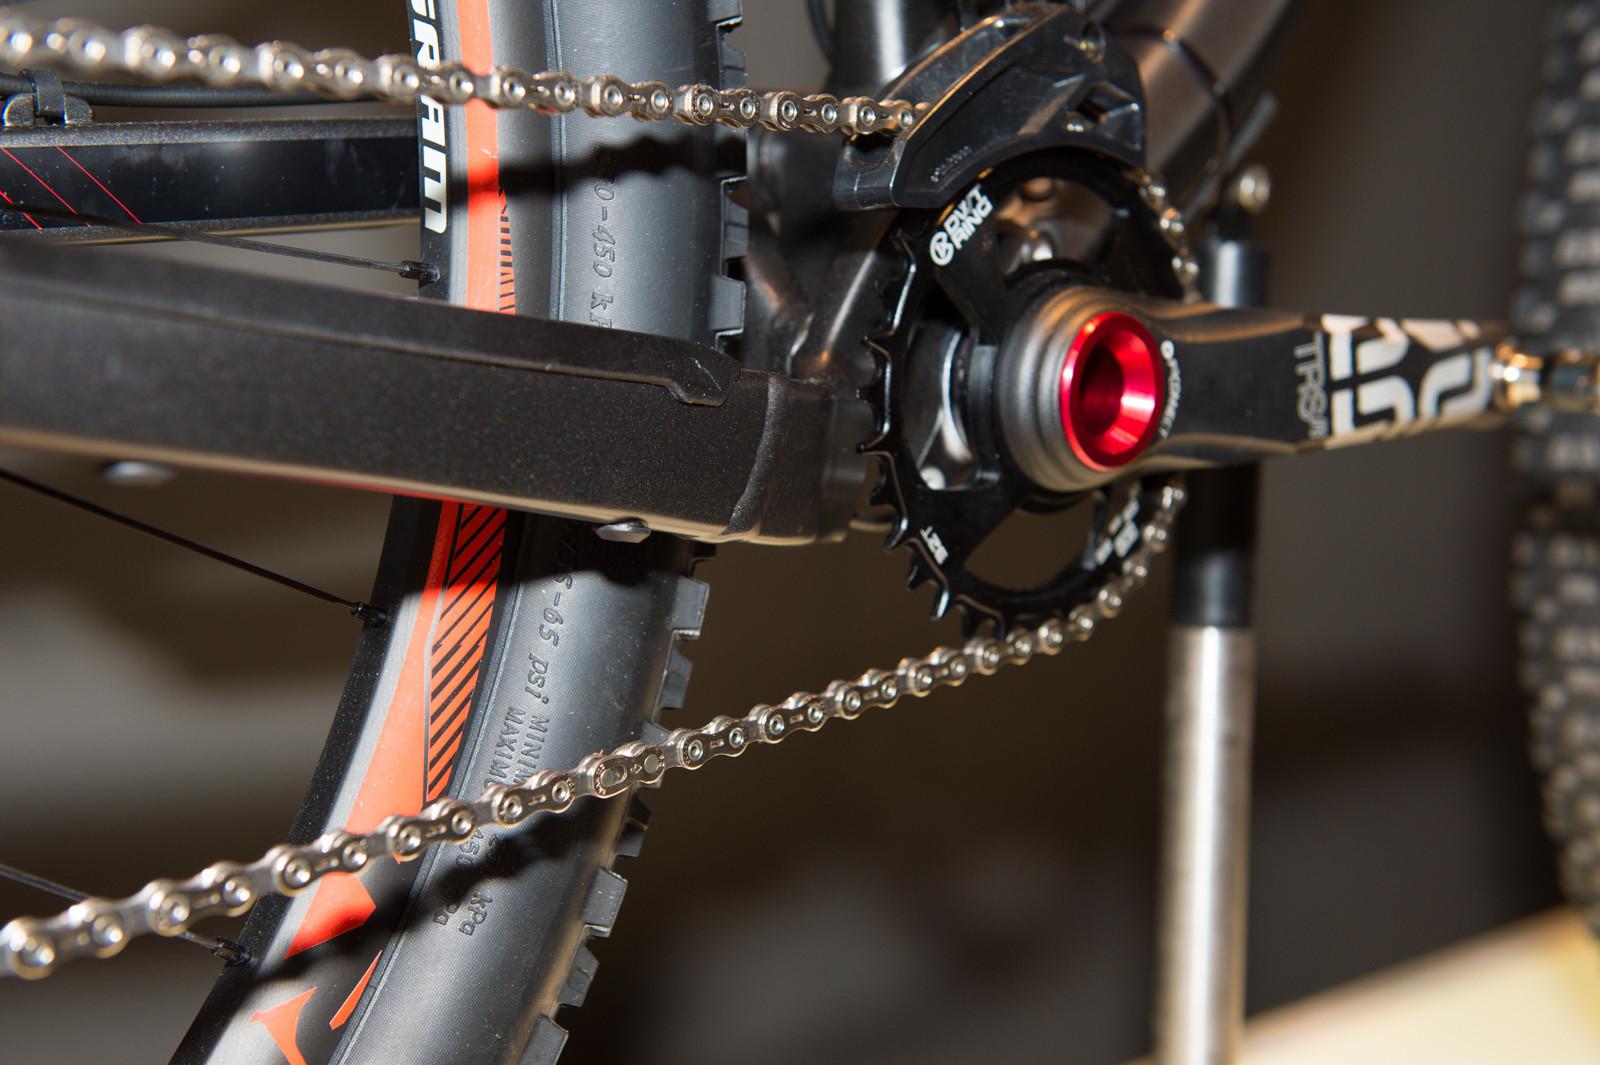 2014 Canyon Spectral Chainguide Boss - 2014 Trail, All-Mountain & Enduro Bikes at Eurobike 2013 - Mountain Biking Pictures - Vital MTB